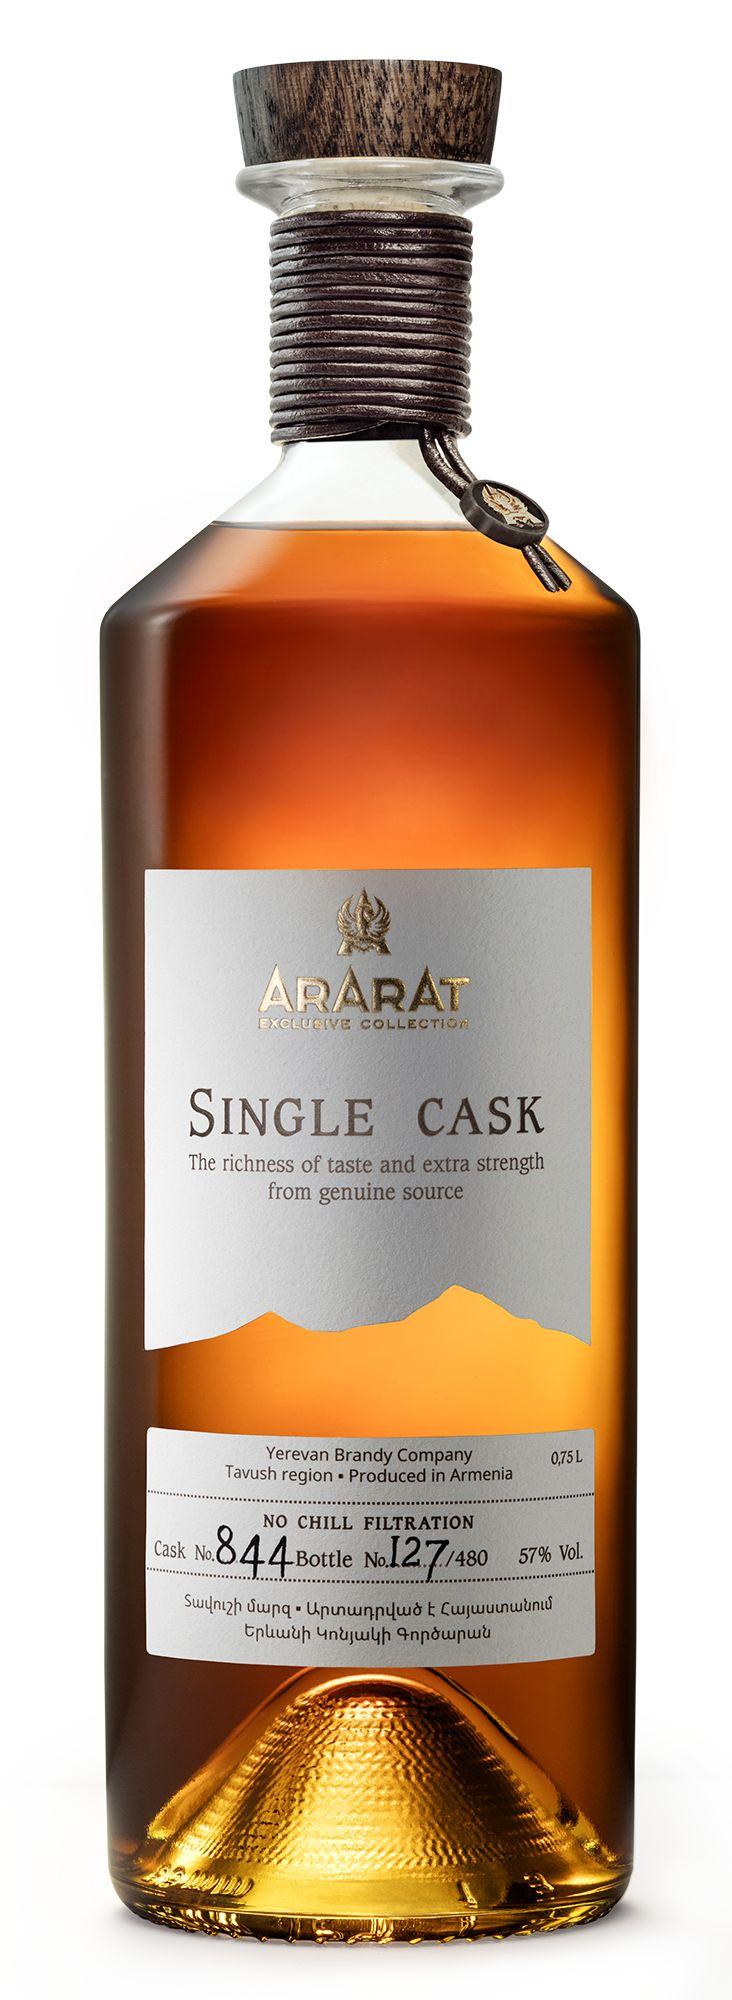 ARARAT Single Cask #moodshot #brandy #packaging #barrel #cask #ybc #cognac #armenia #bottle #sun #amber #gold